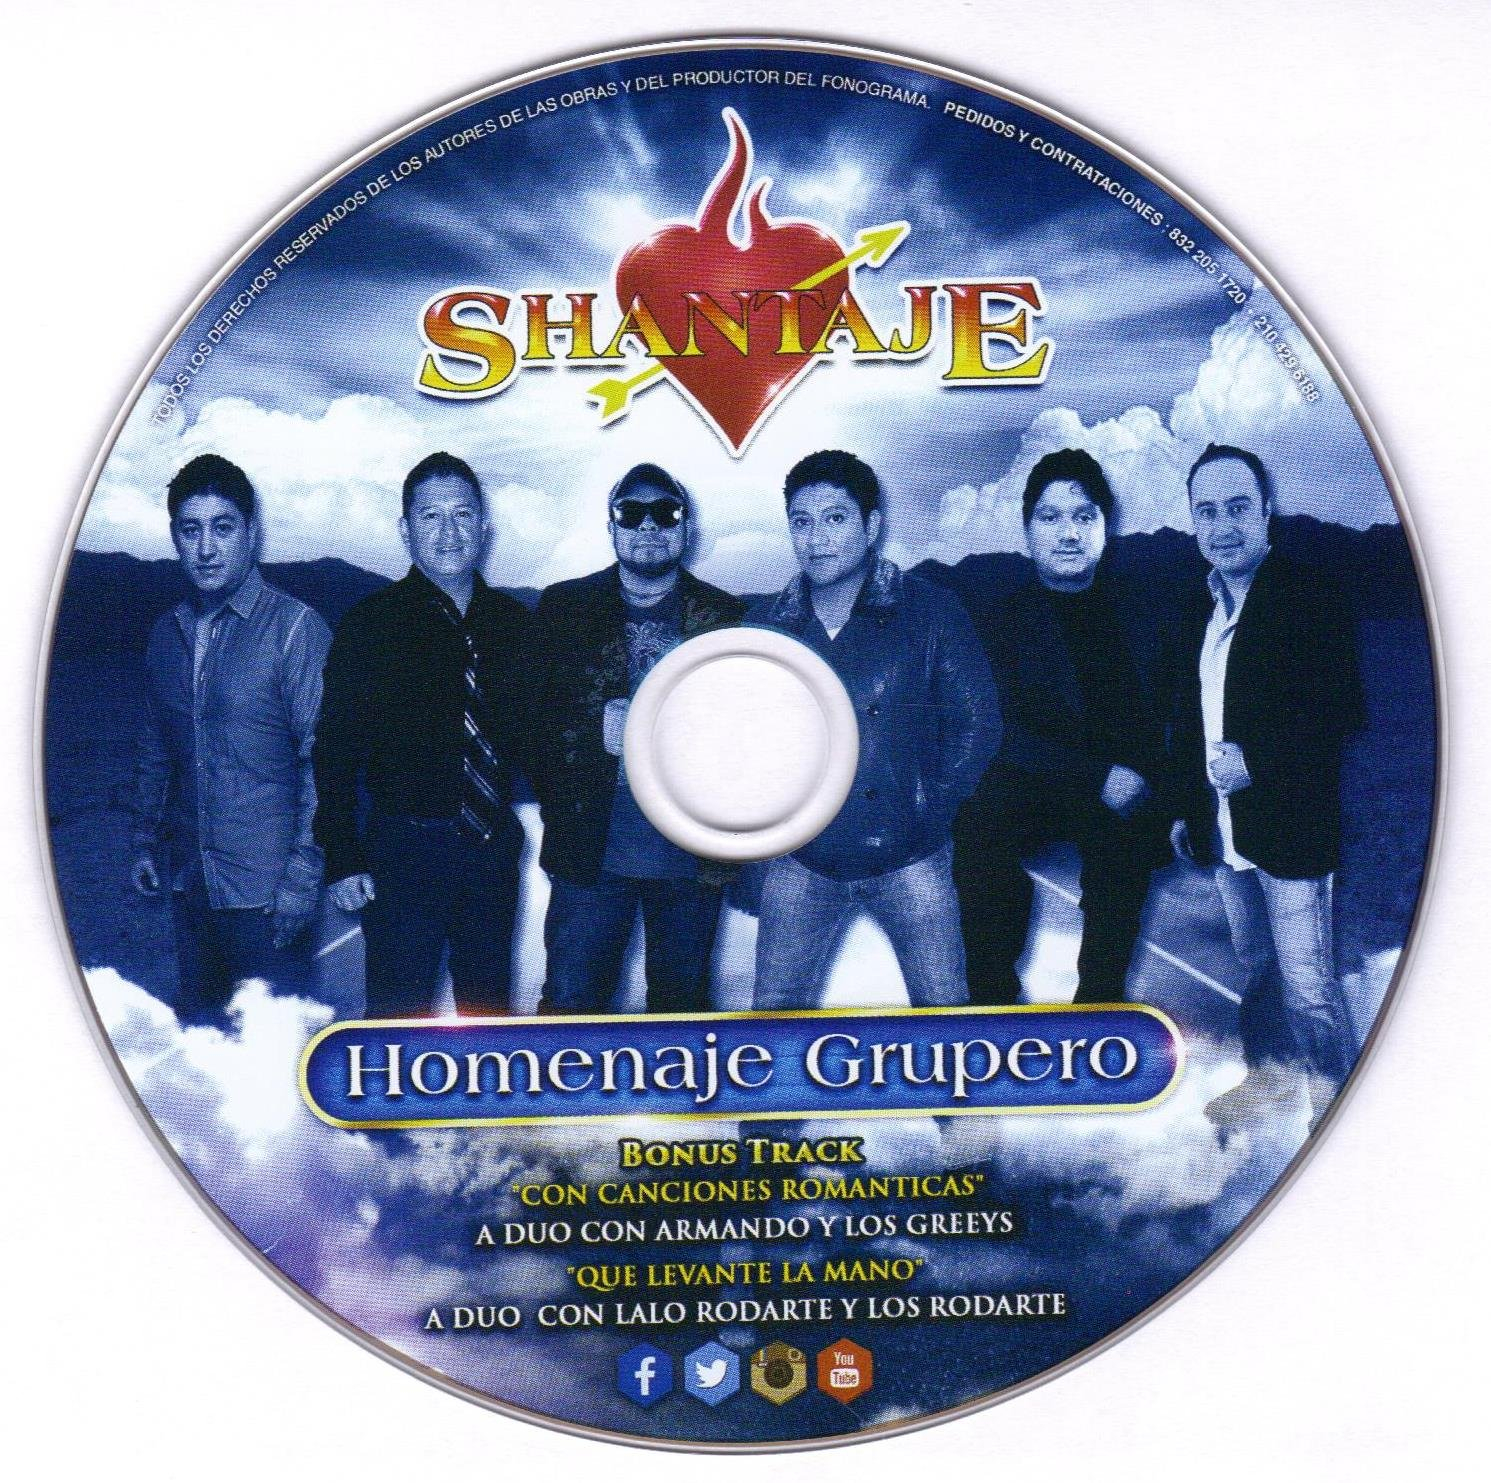 Shantaje...Homenaje Grupero... by 2015 MJ Estudios